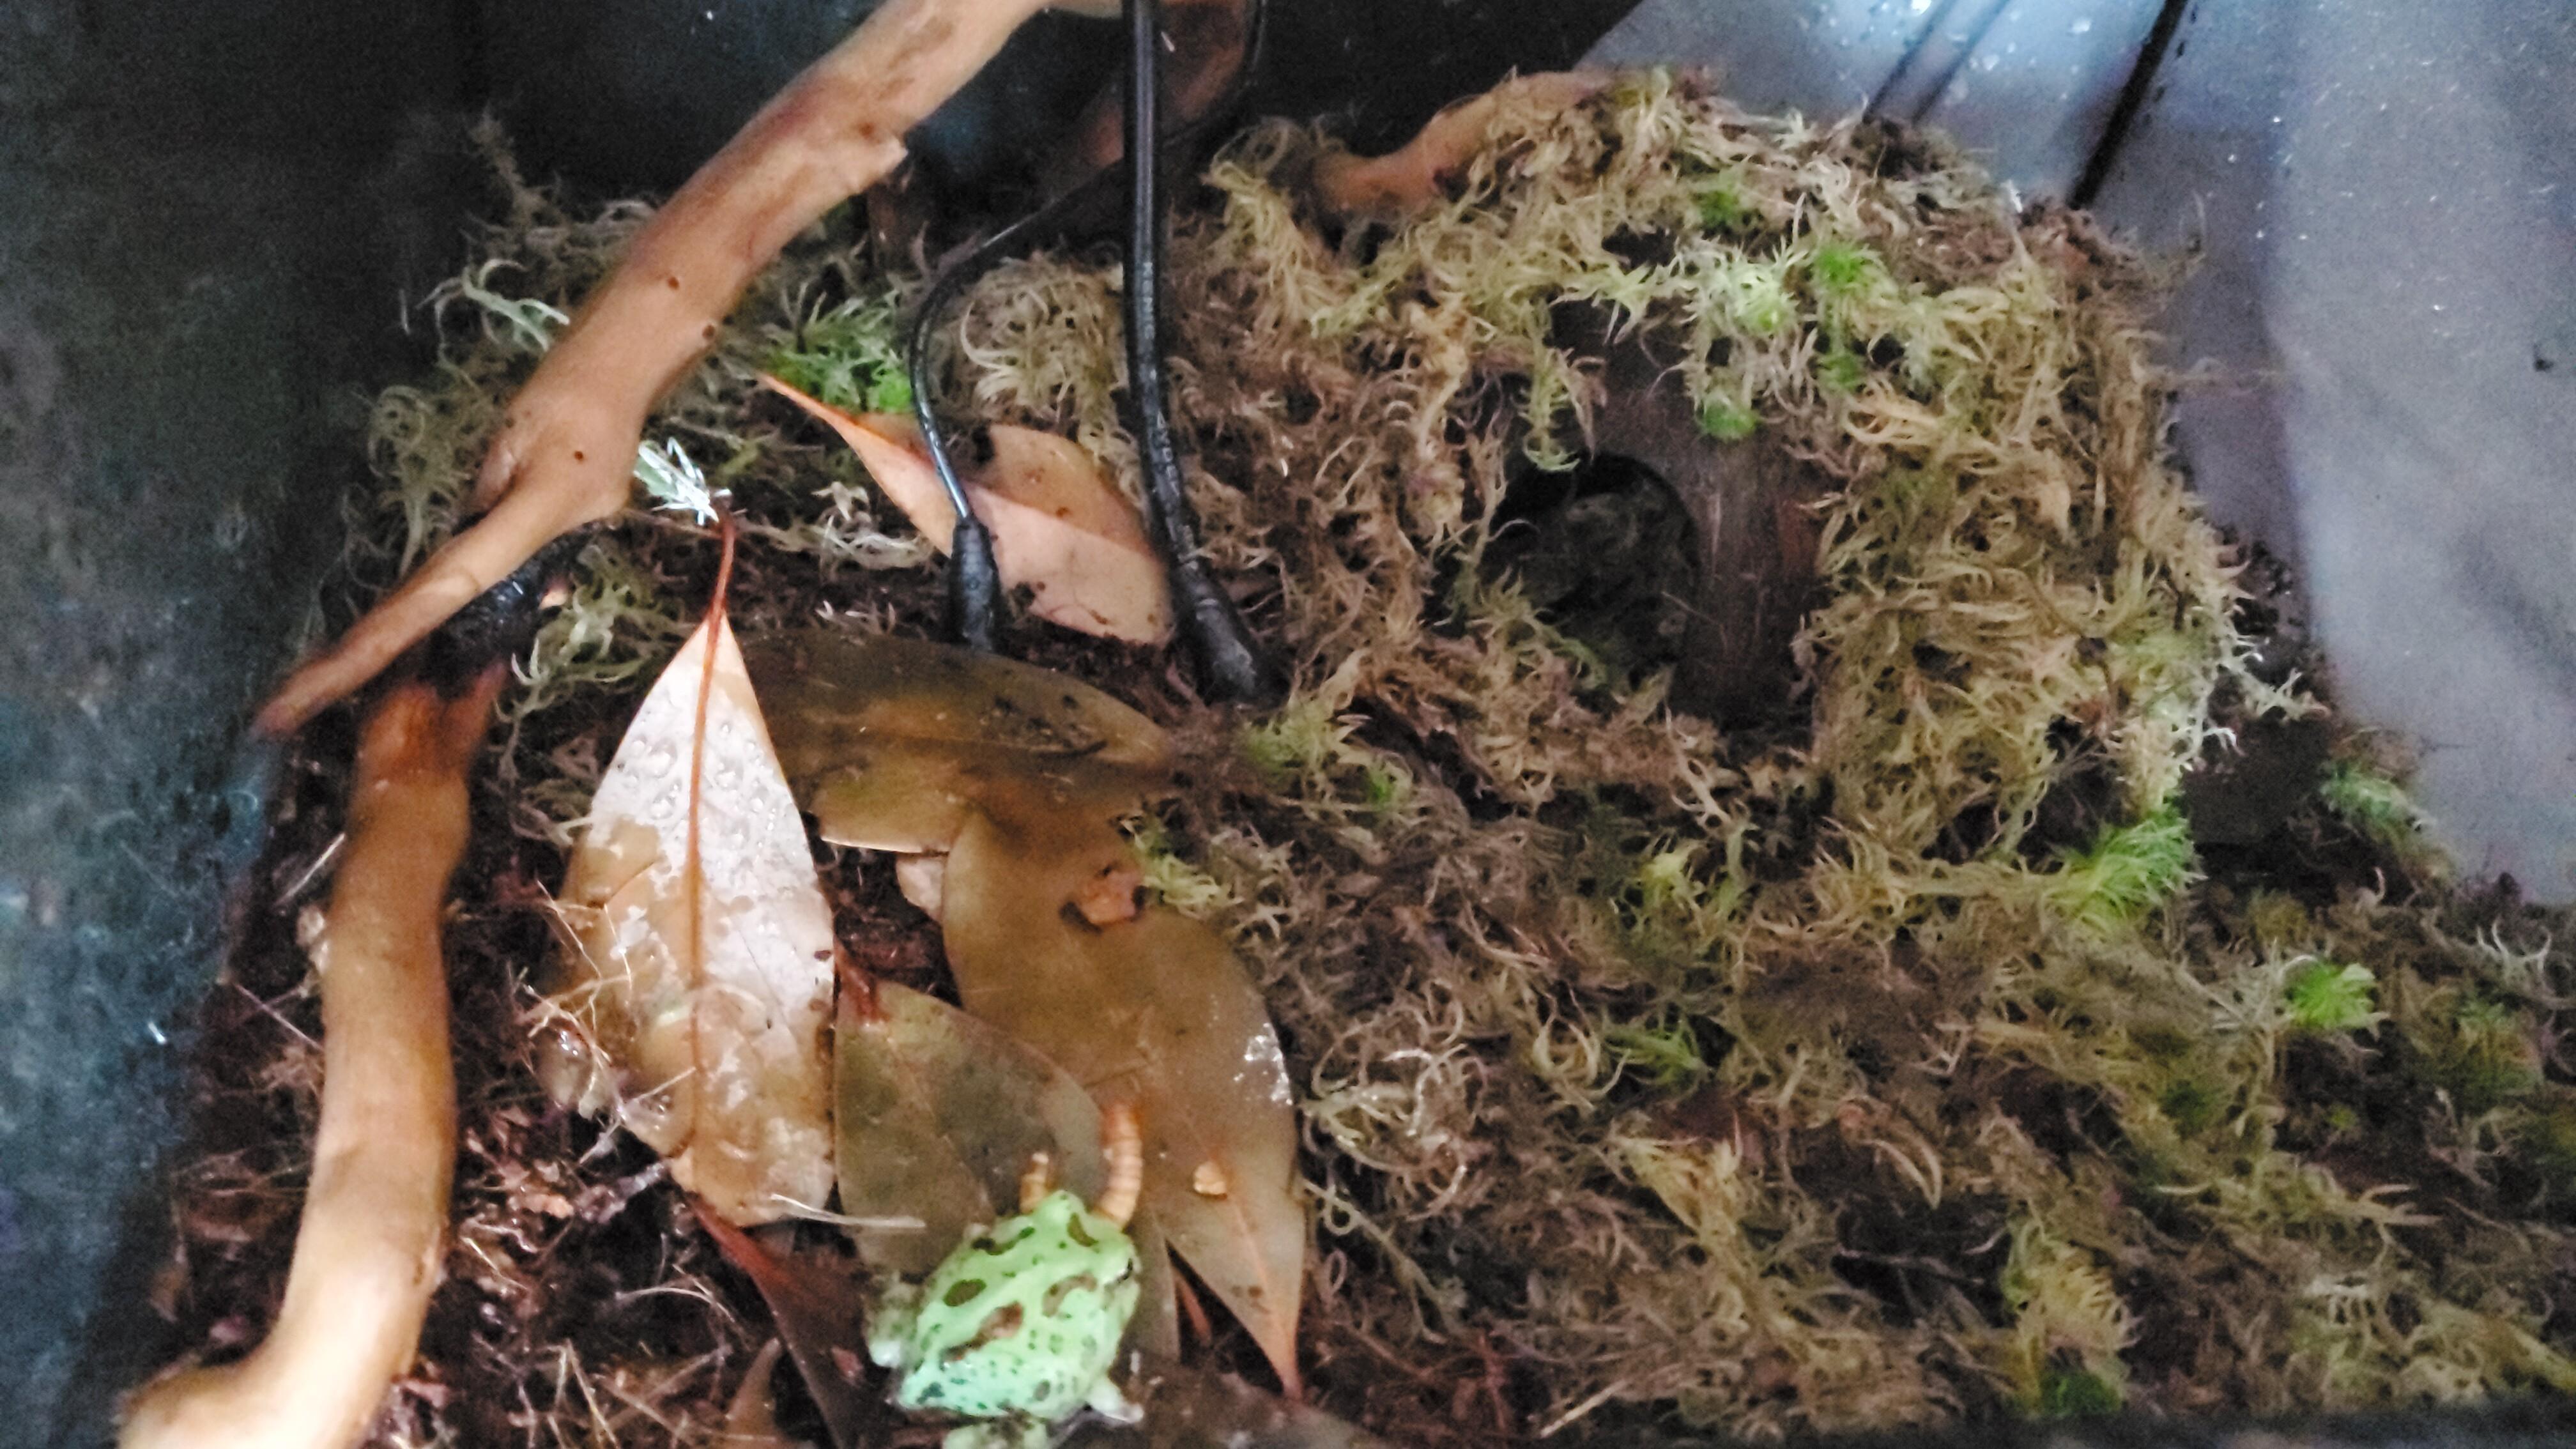 Pacman frog not eating.-img-20201009-wa0004_1602259053560.jpeg